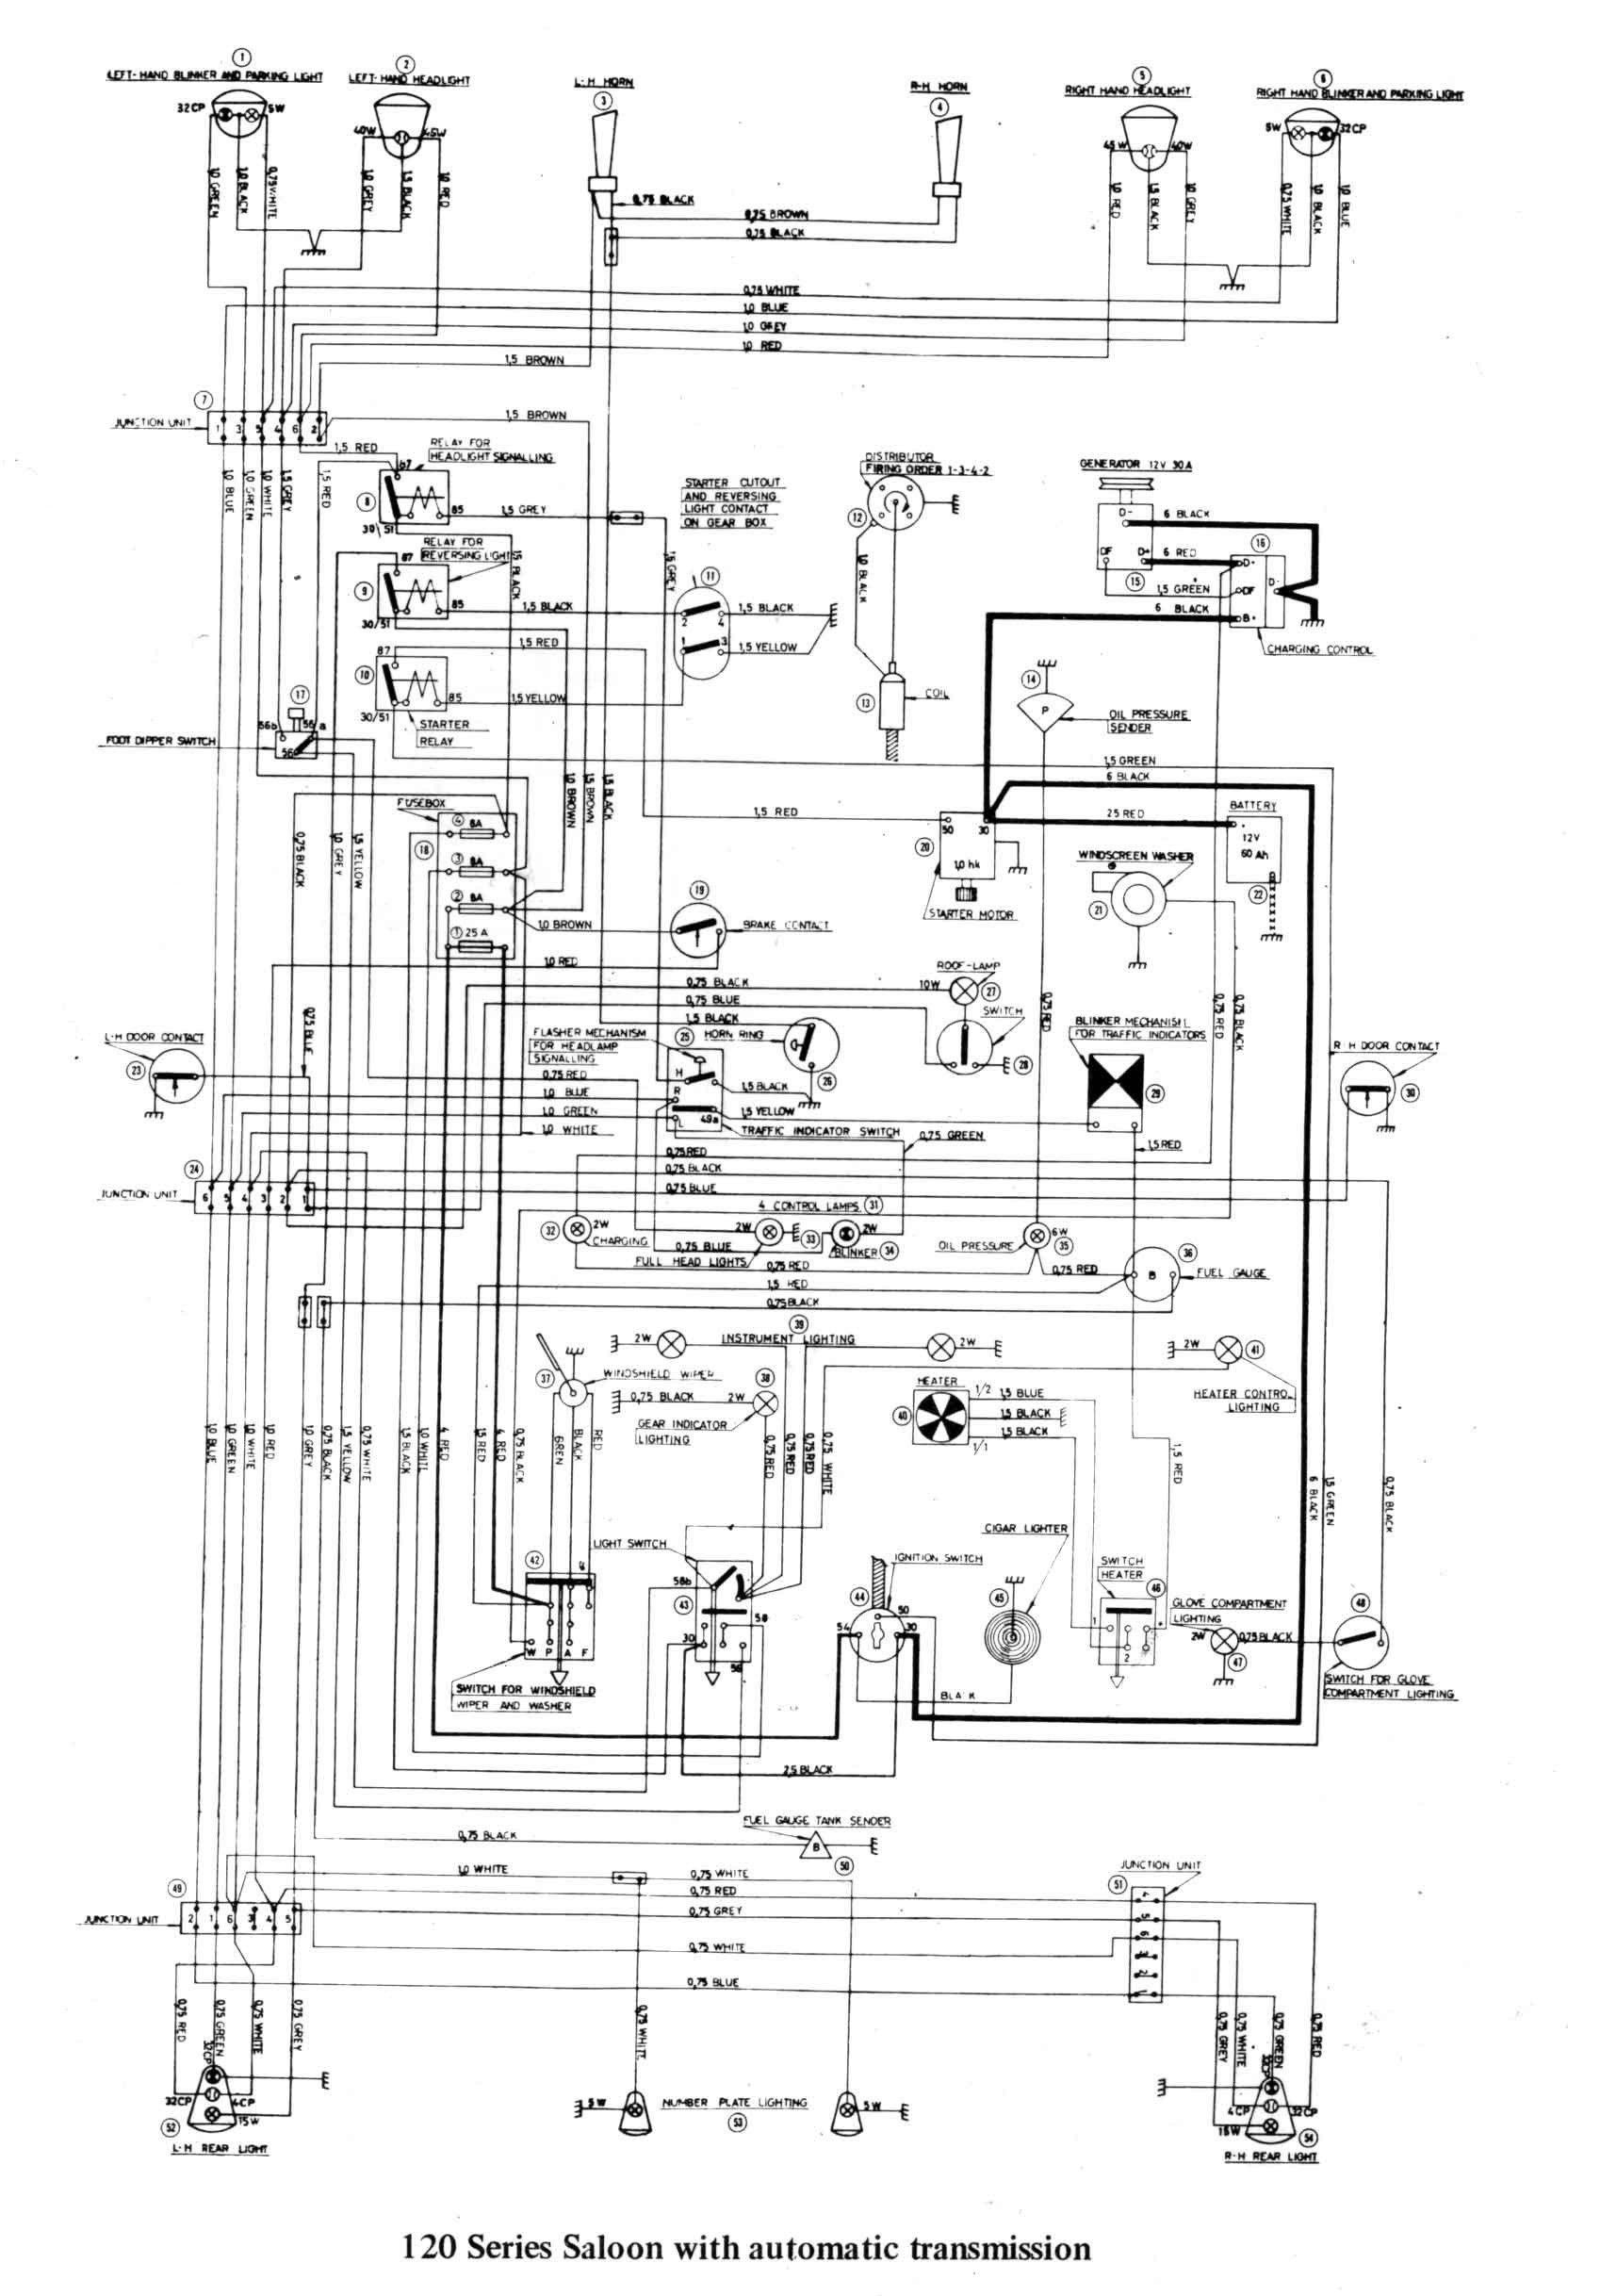 Inspirational Peterbilt 359 Wiring Diagram In 2020 Electrical Wiring Diagram Trailer Wiring Diagram Diagram